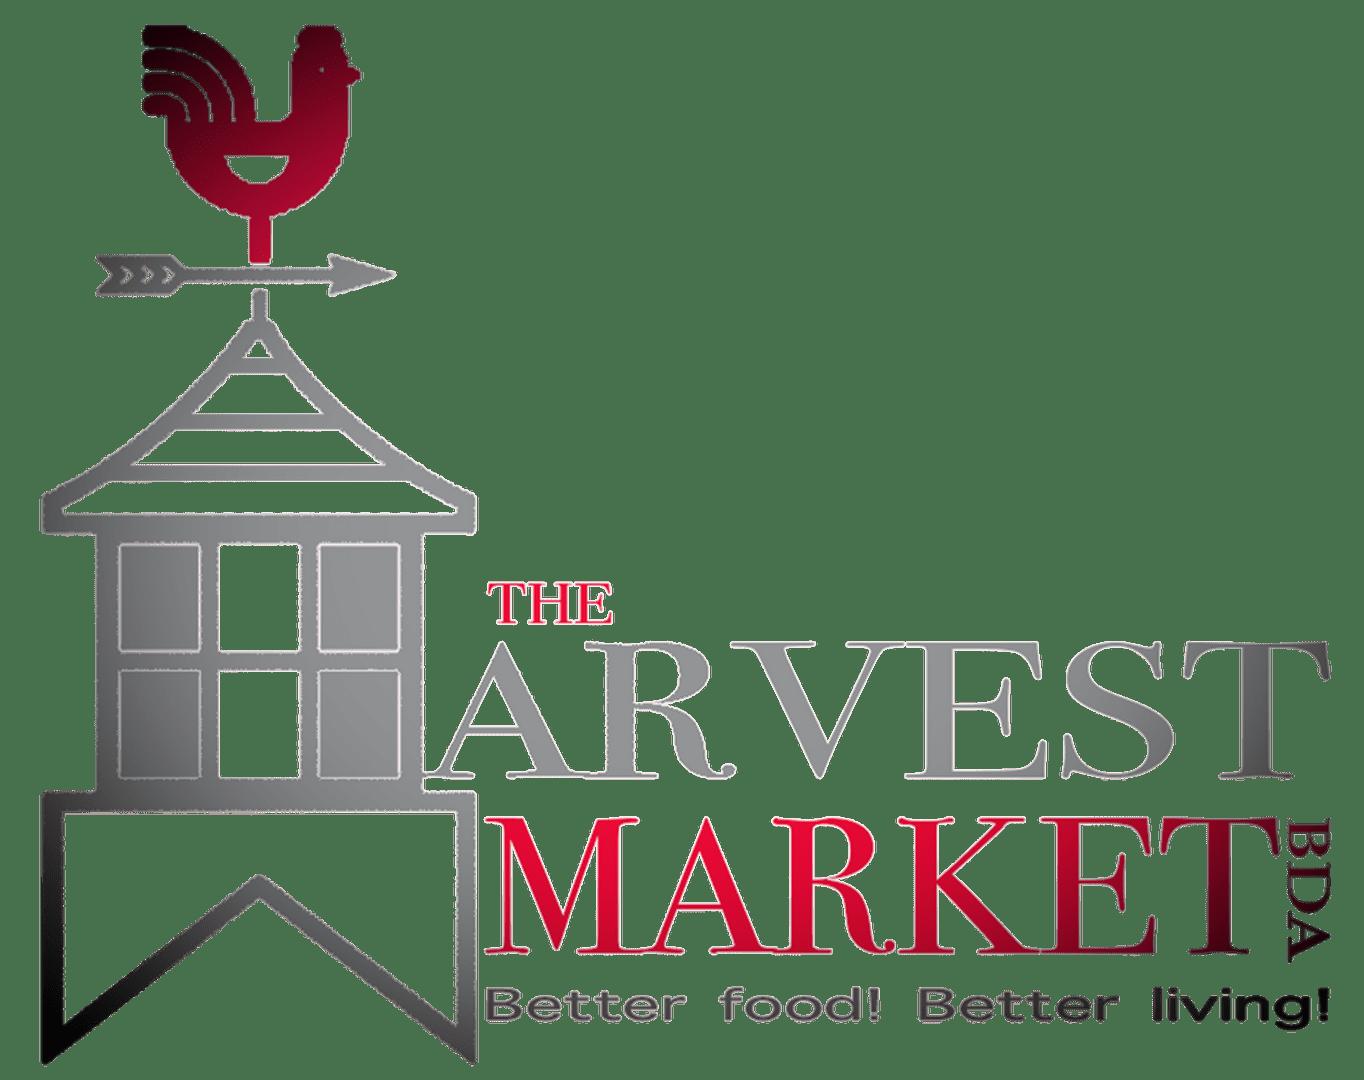 The Harvest Market Bermuda ORDER NOW! image